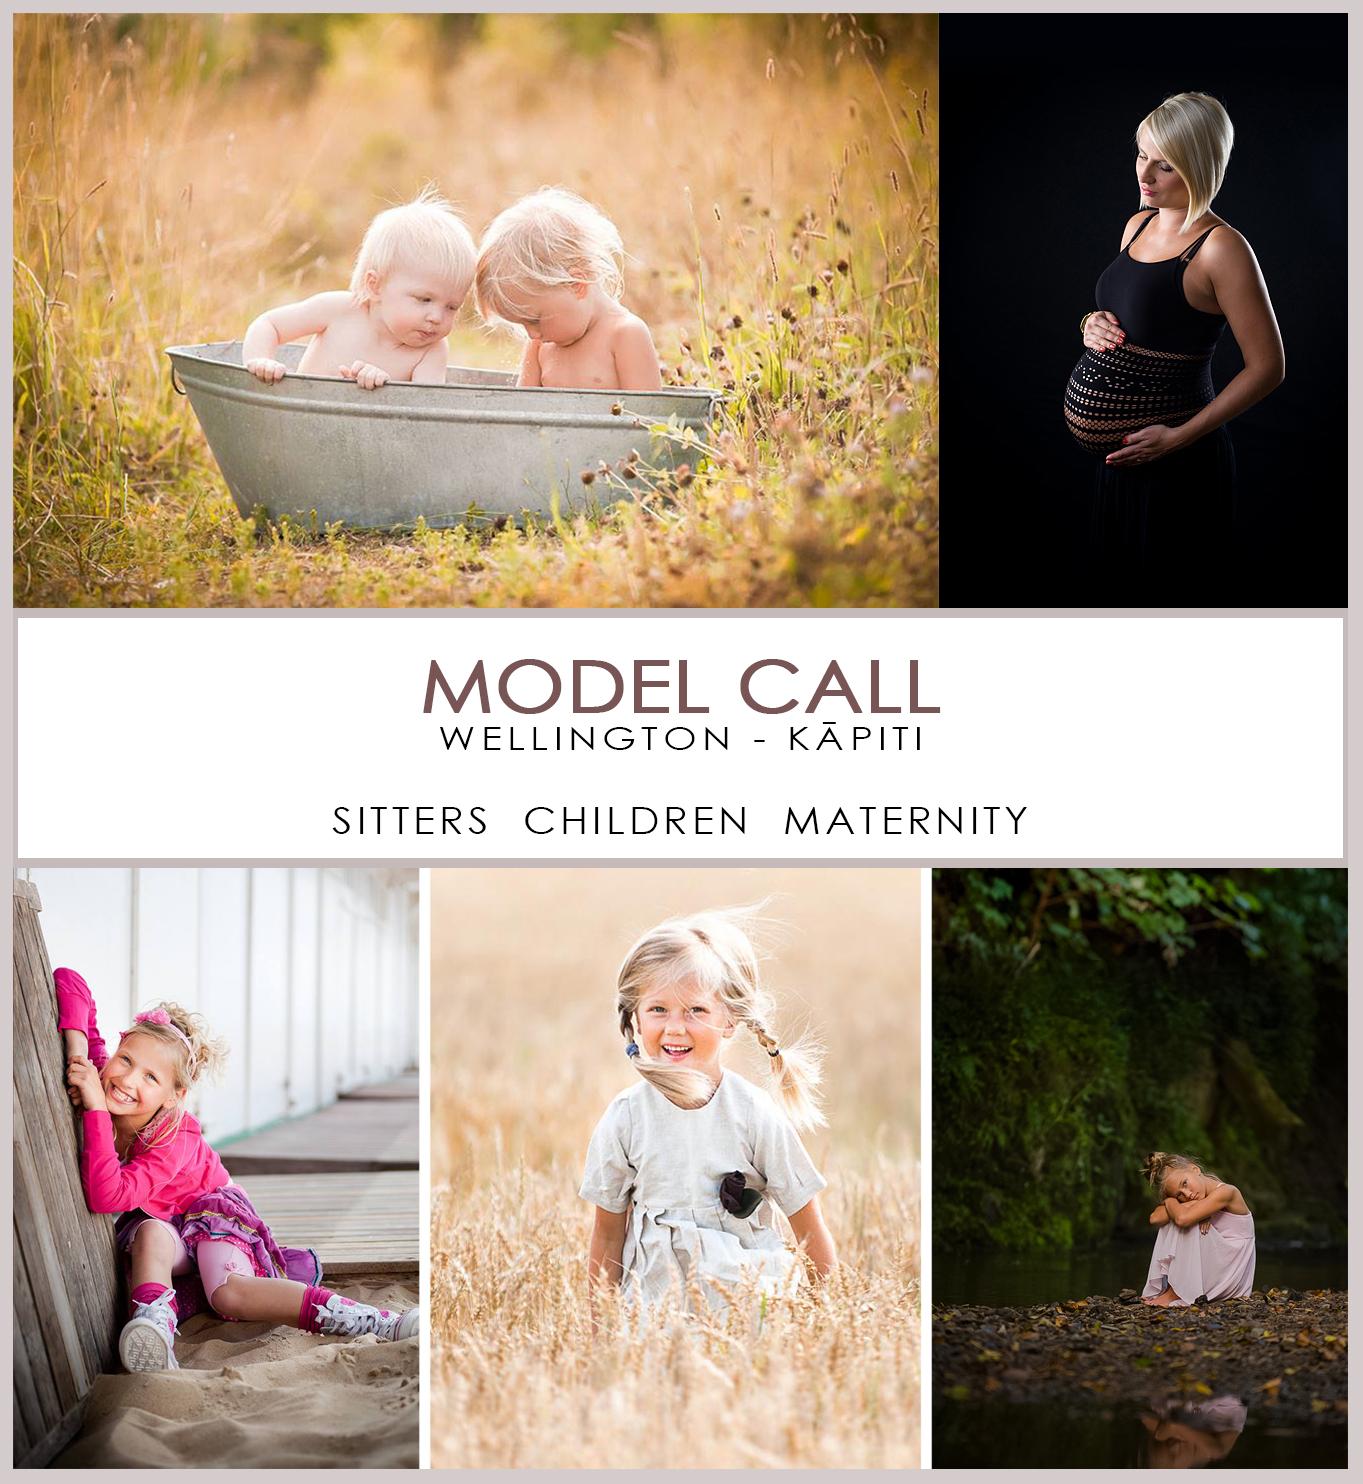 modelcall_3